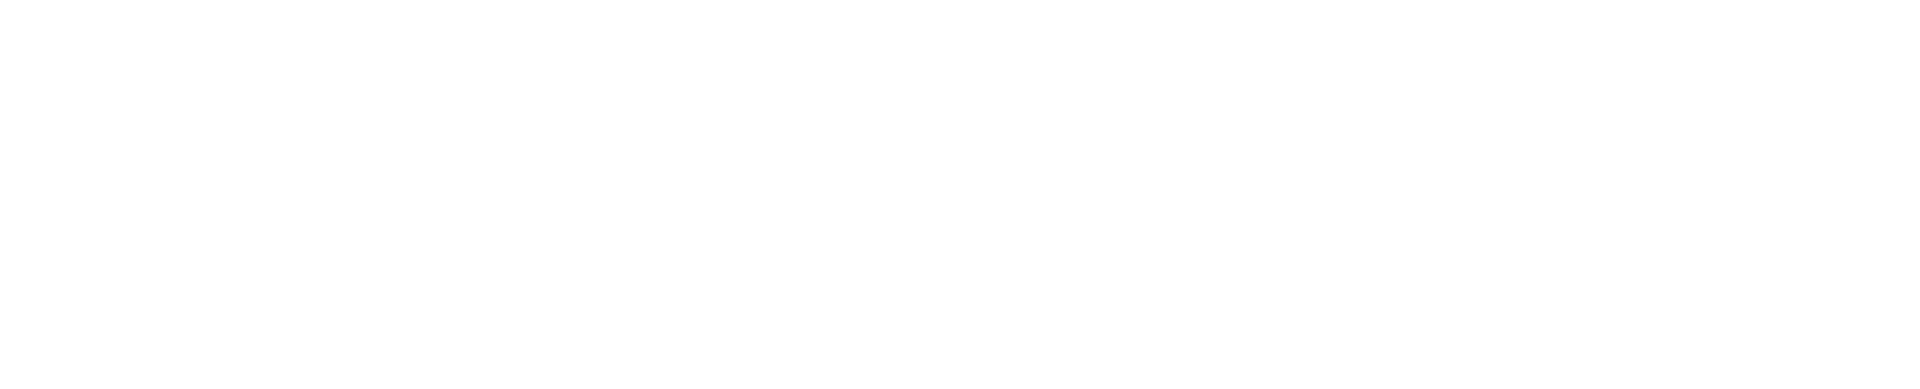 oneflare icon